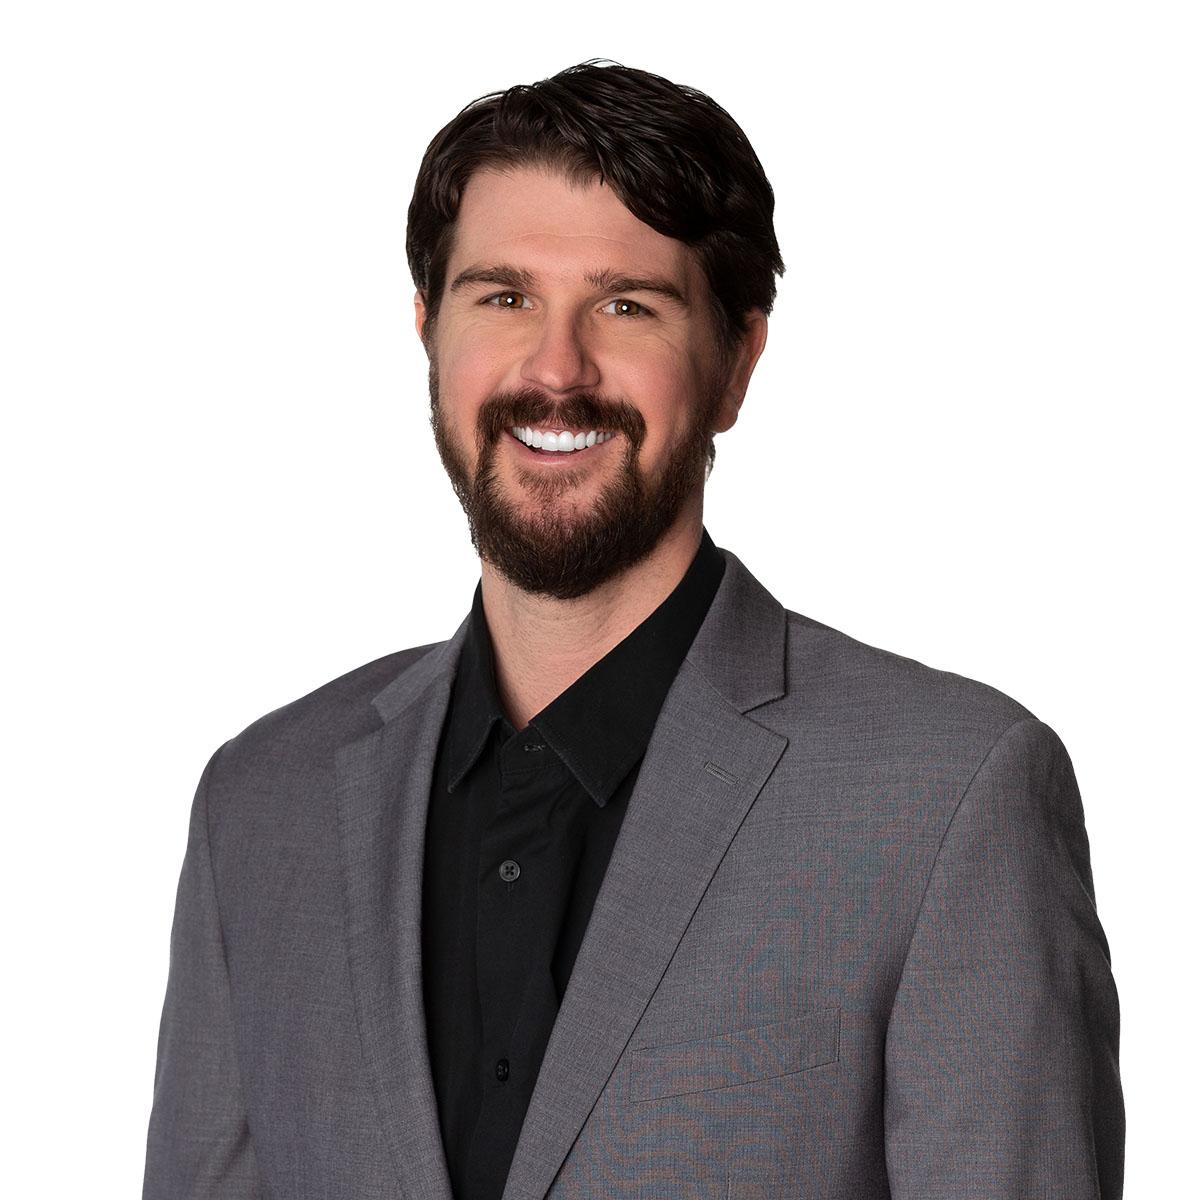 Ryan Nelson